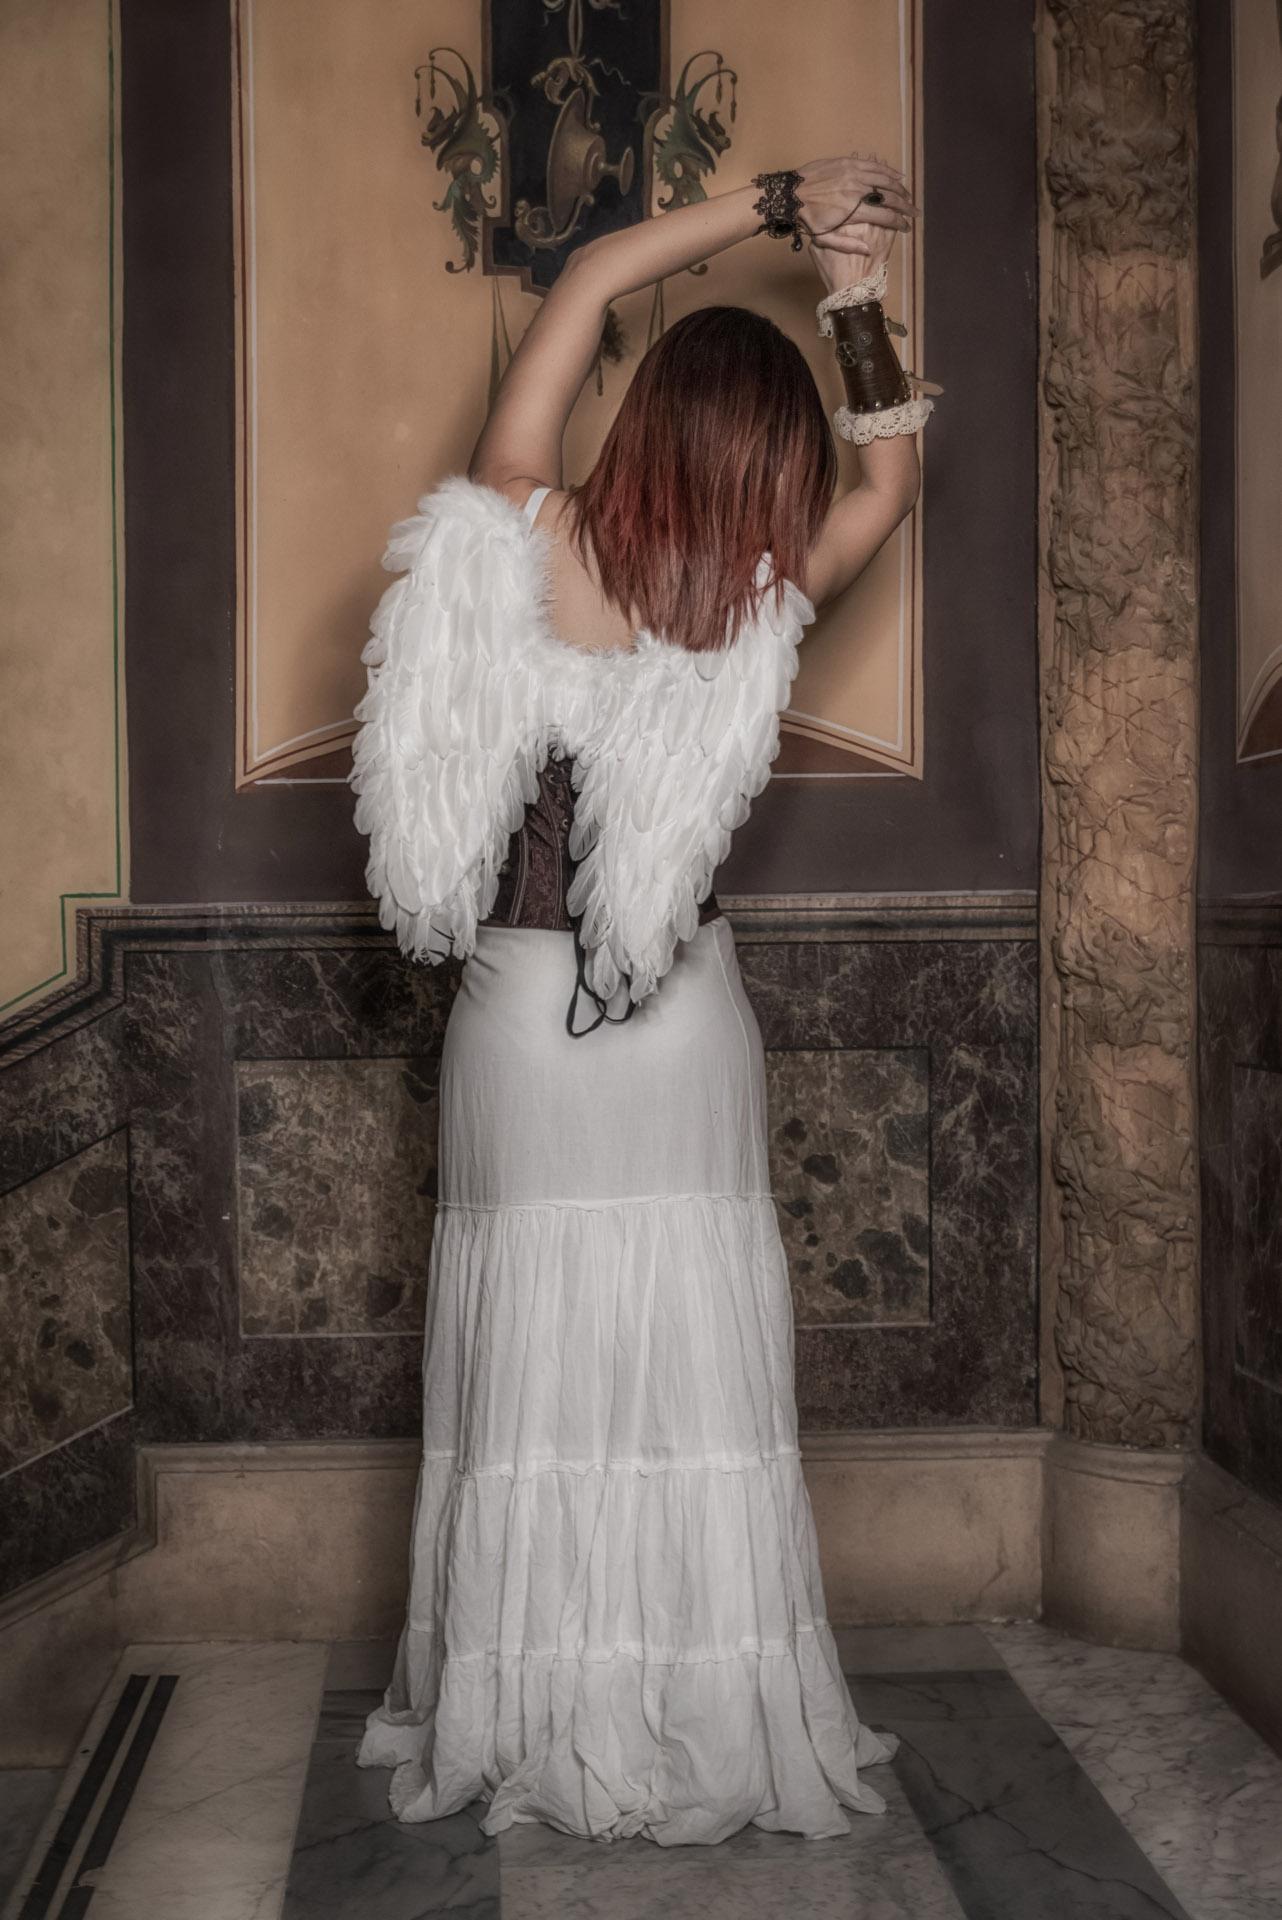 Categorie: Fine Art, Portrait; Photographer: FRANCESCO SCALZO; Model & Story: MIRIAM CARUSO; Location: Cosenza, CS, Italia